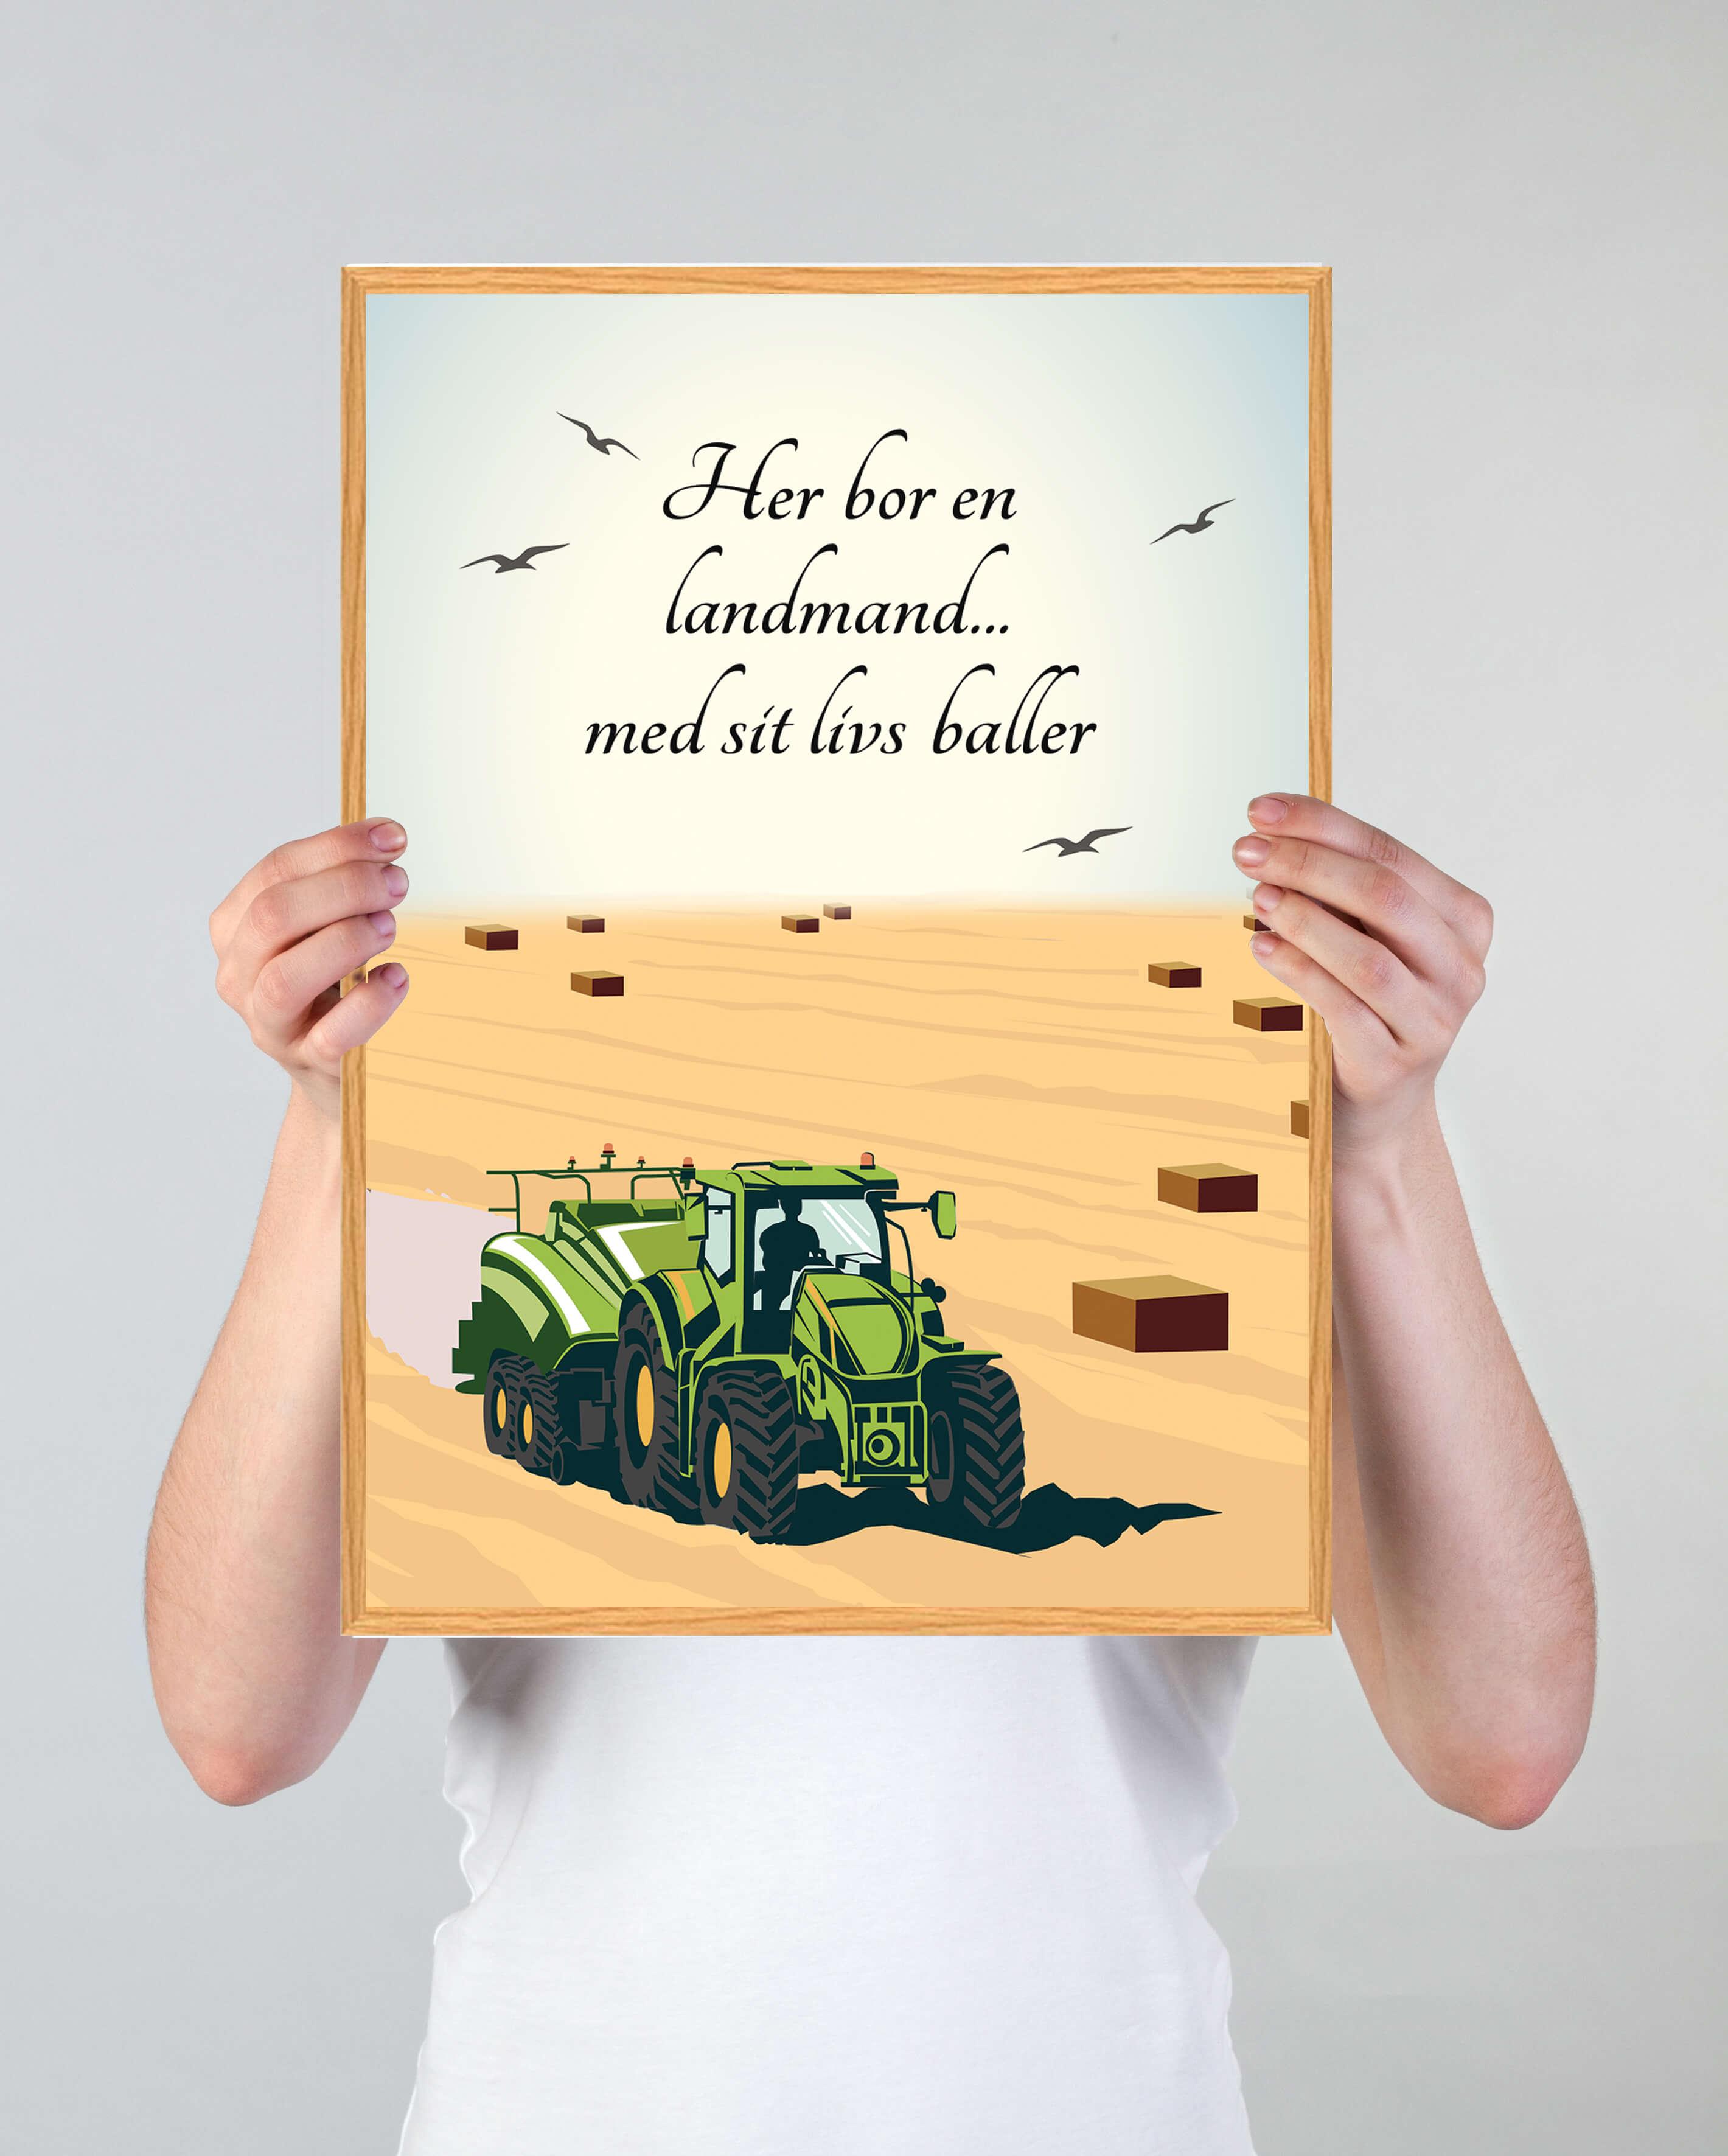 landmand-arbejde-baller-2